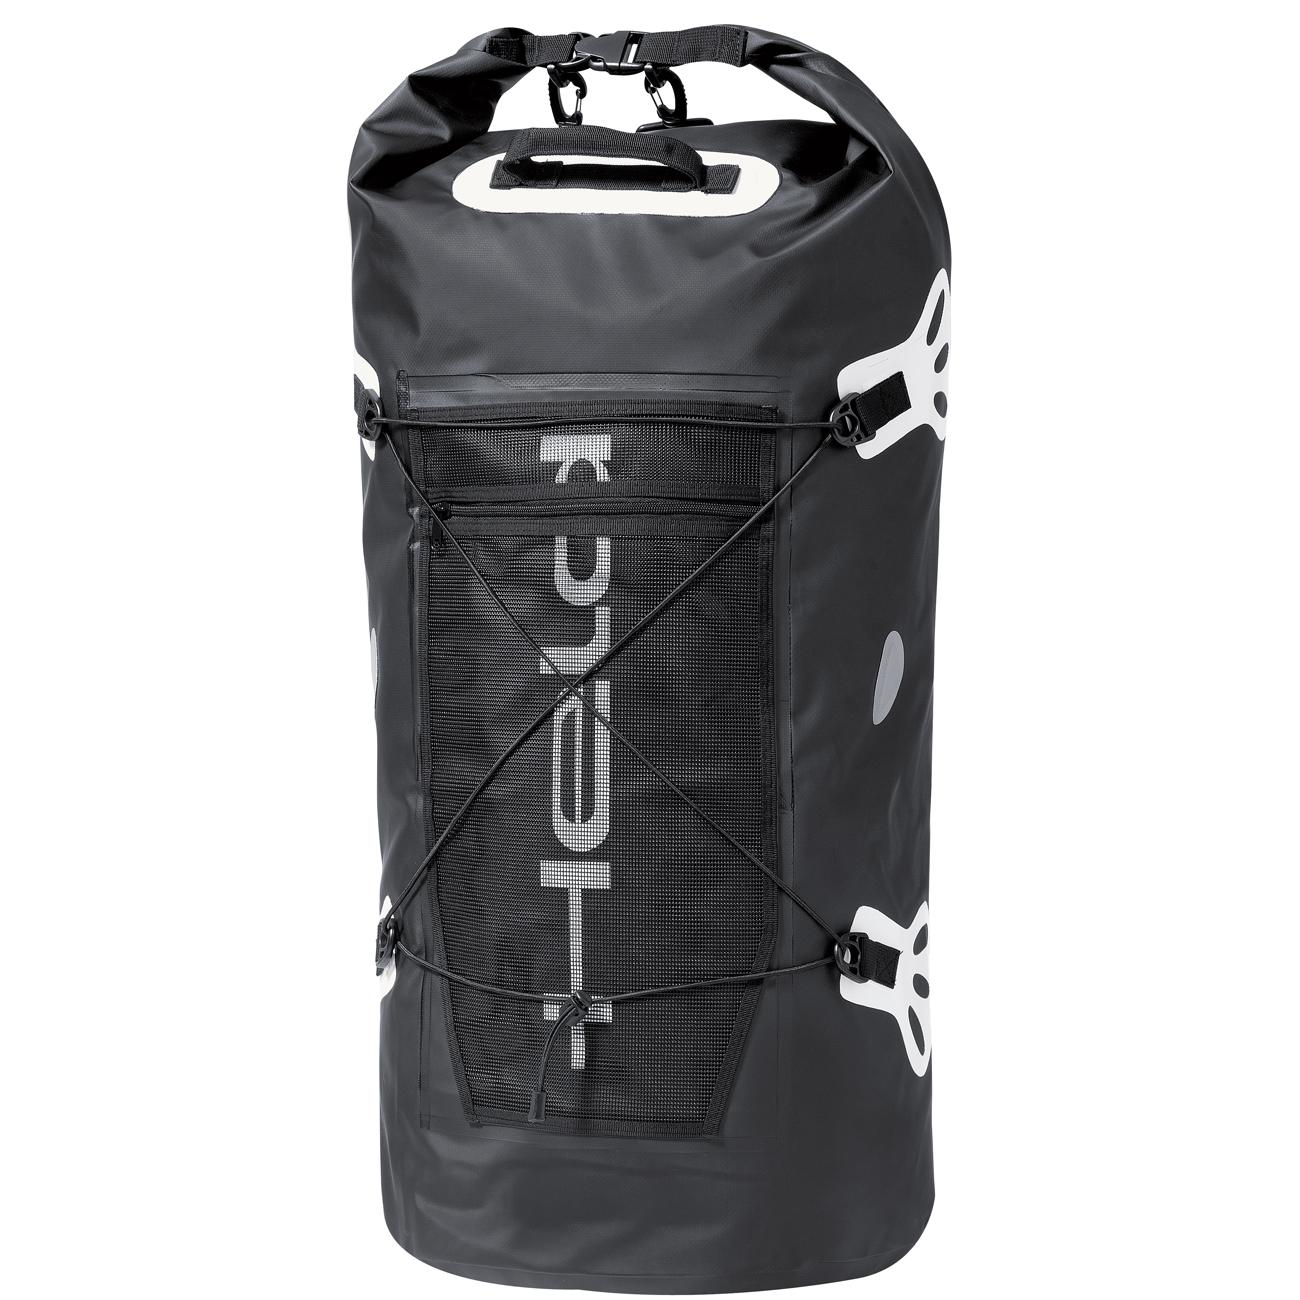 Held Roll-Bag Black 60L